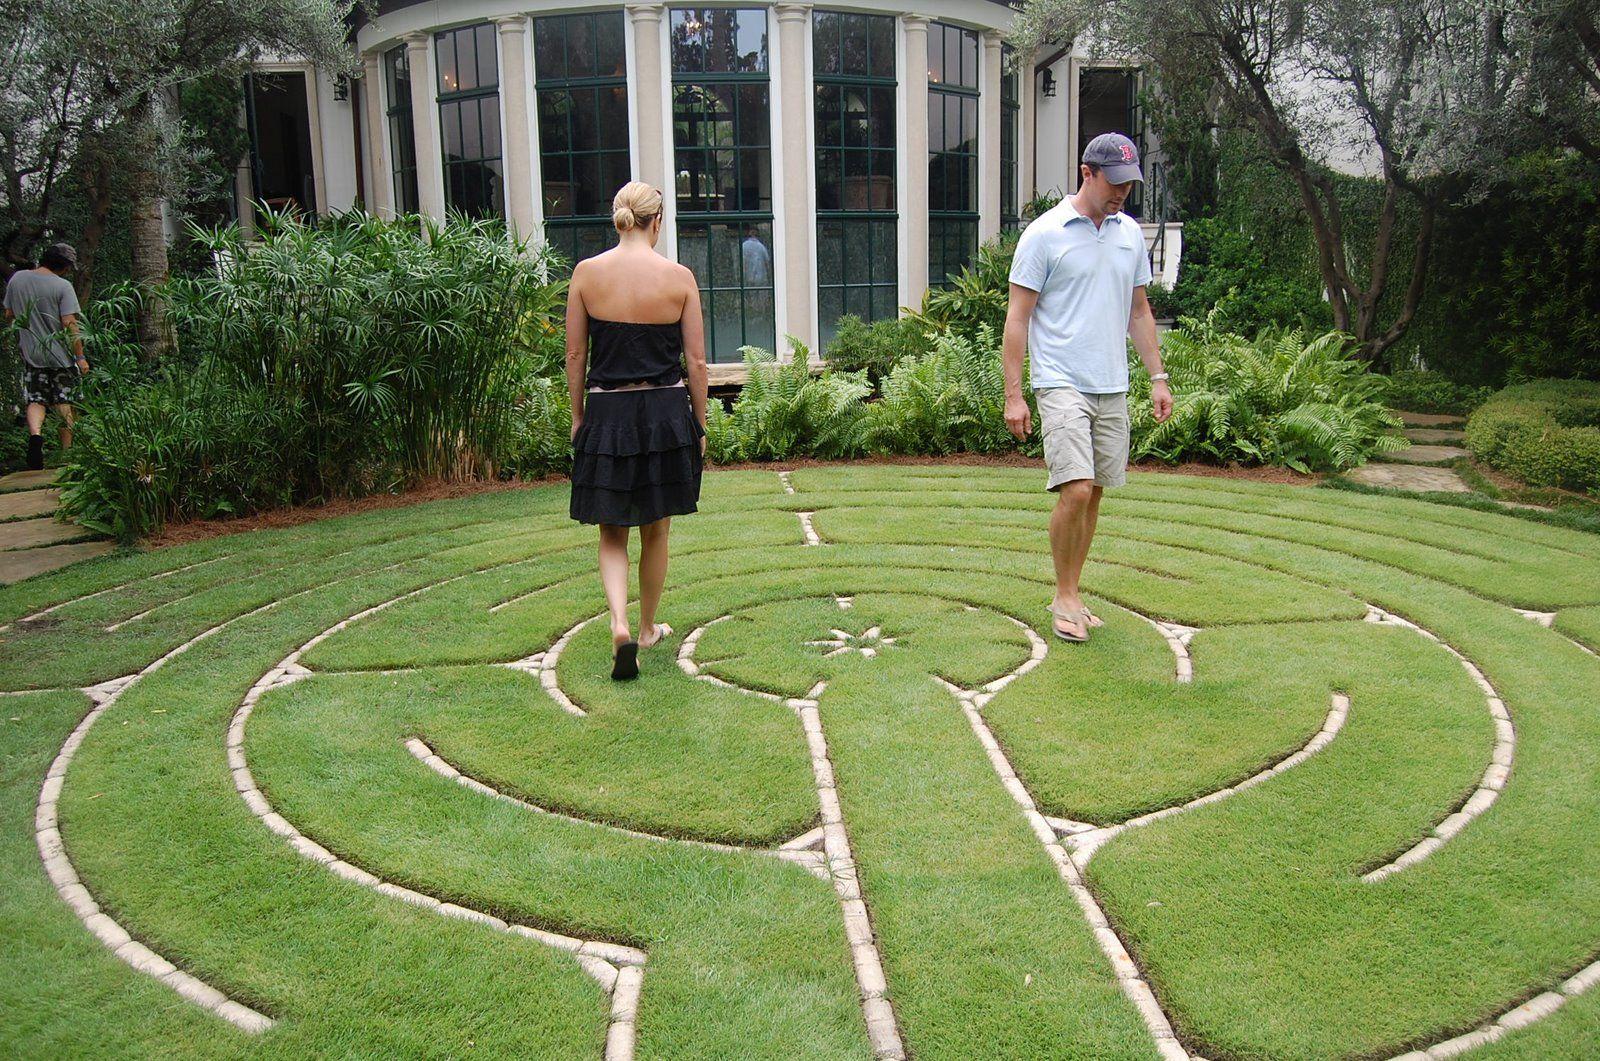 backyard labyrinth very simple and elegant labyrinths